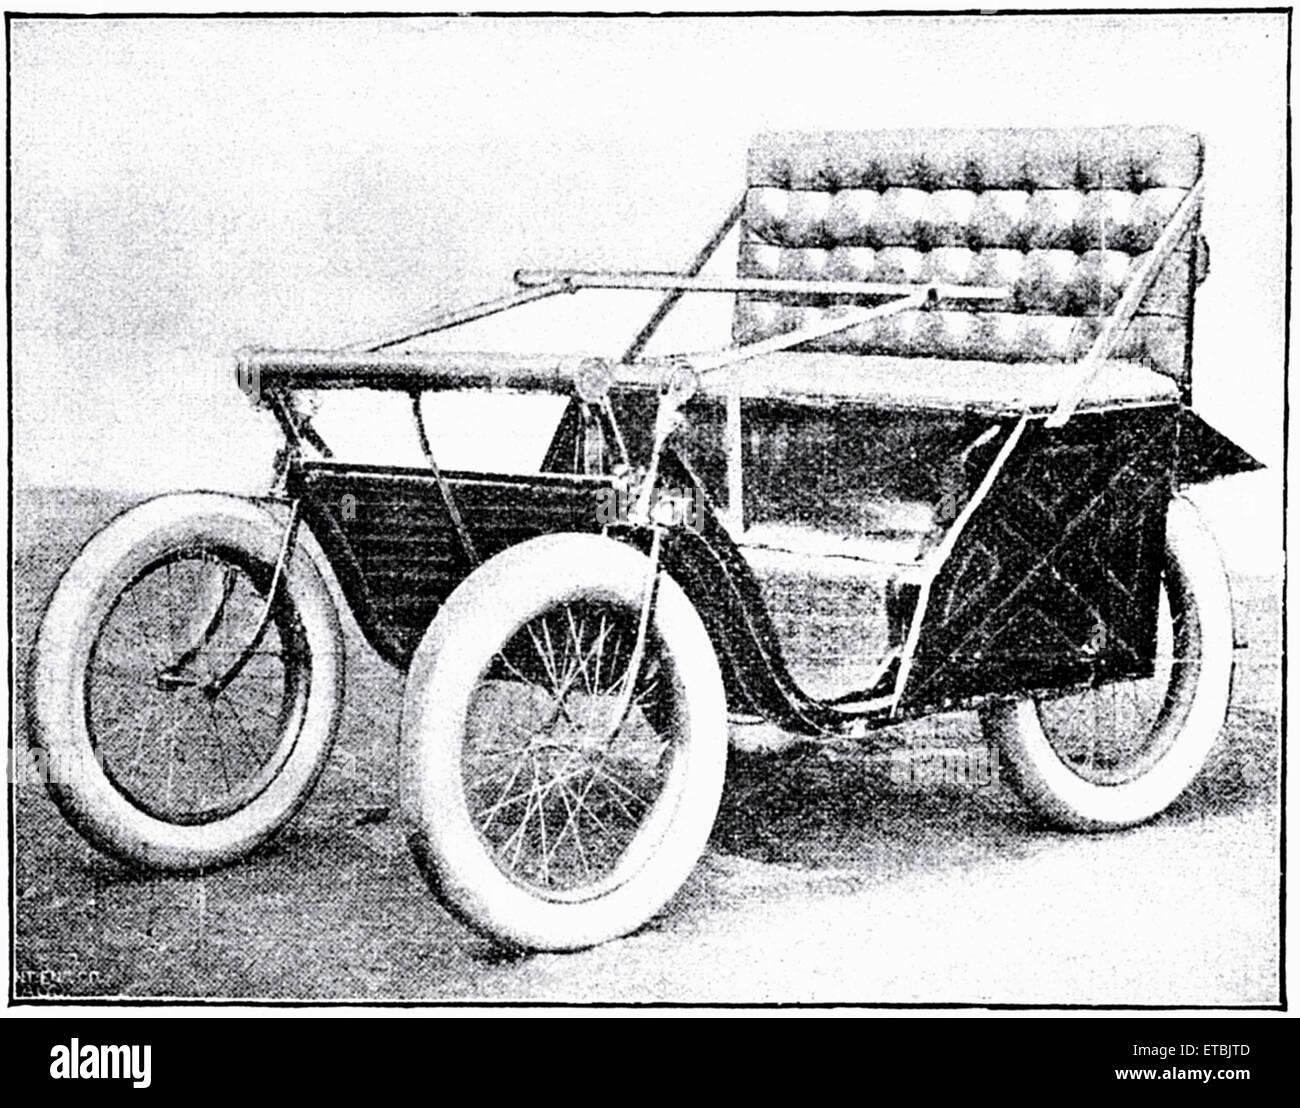 Victoria Motorette, Racine Motor Vehicle Company, ca. 1895 Stockbild